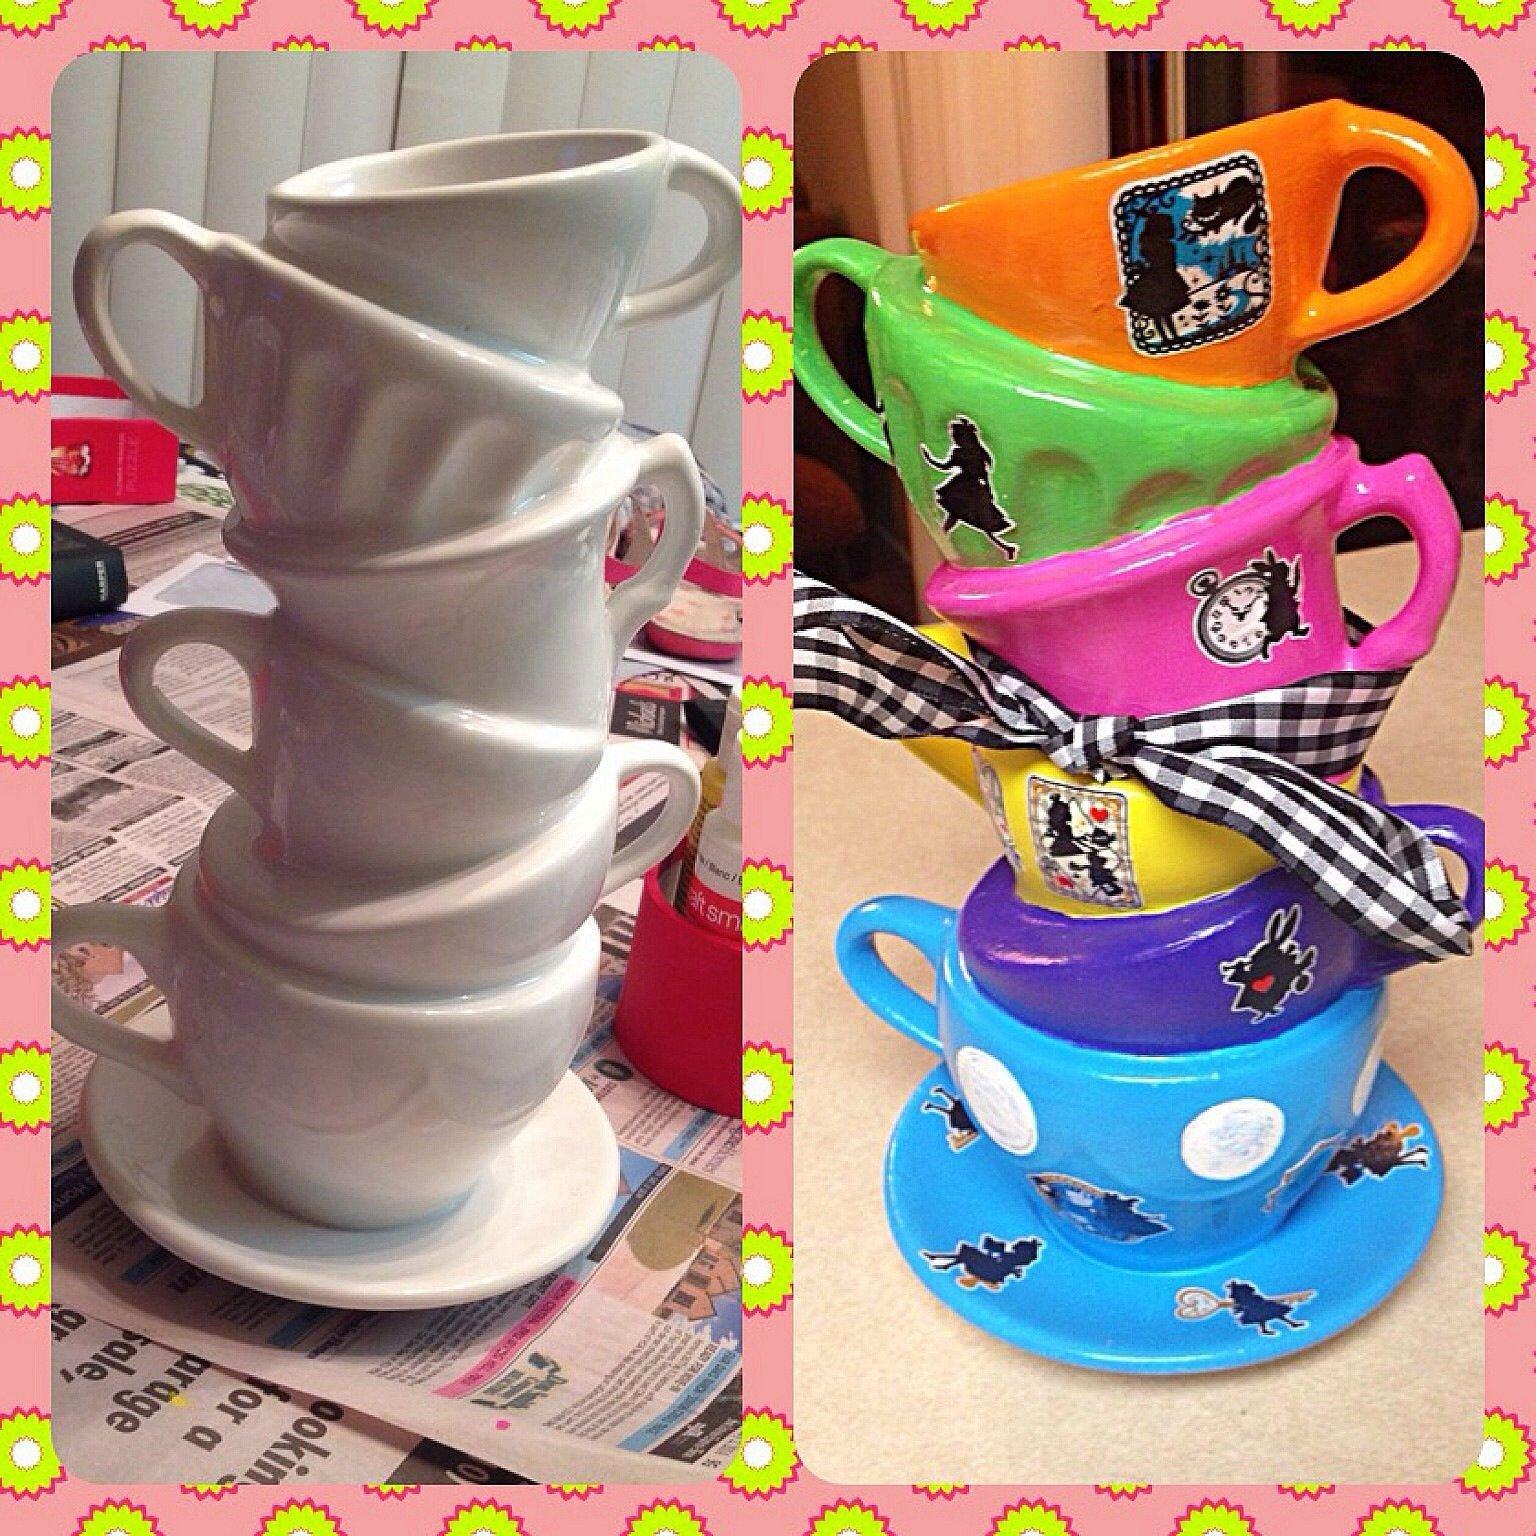 10 Lovable Alice In Wonderland Centerpiece Ideas diy alice in wonderland centerpiece my crafts pinterest alice